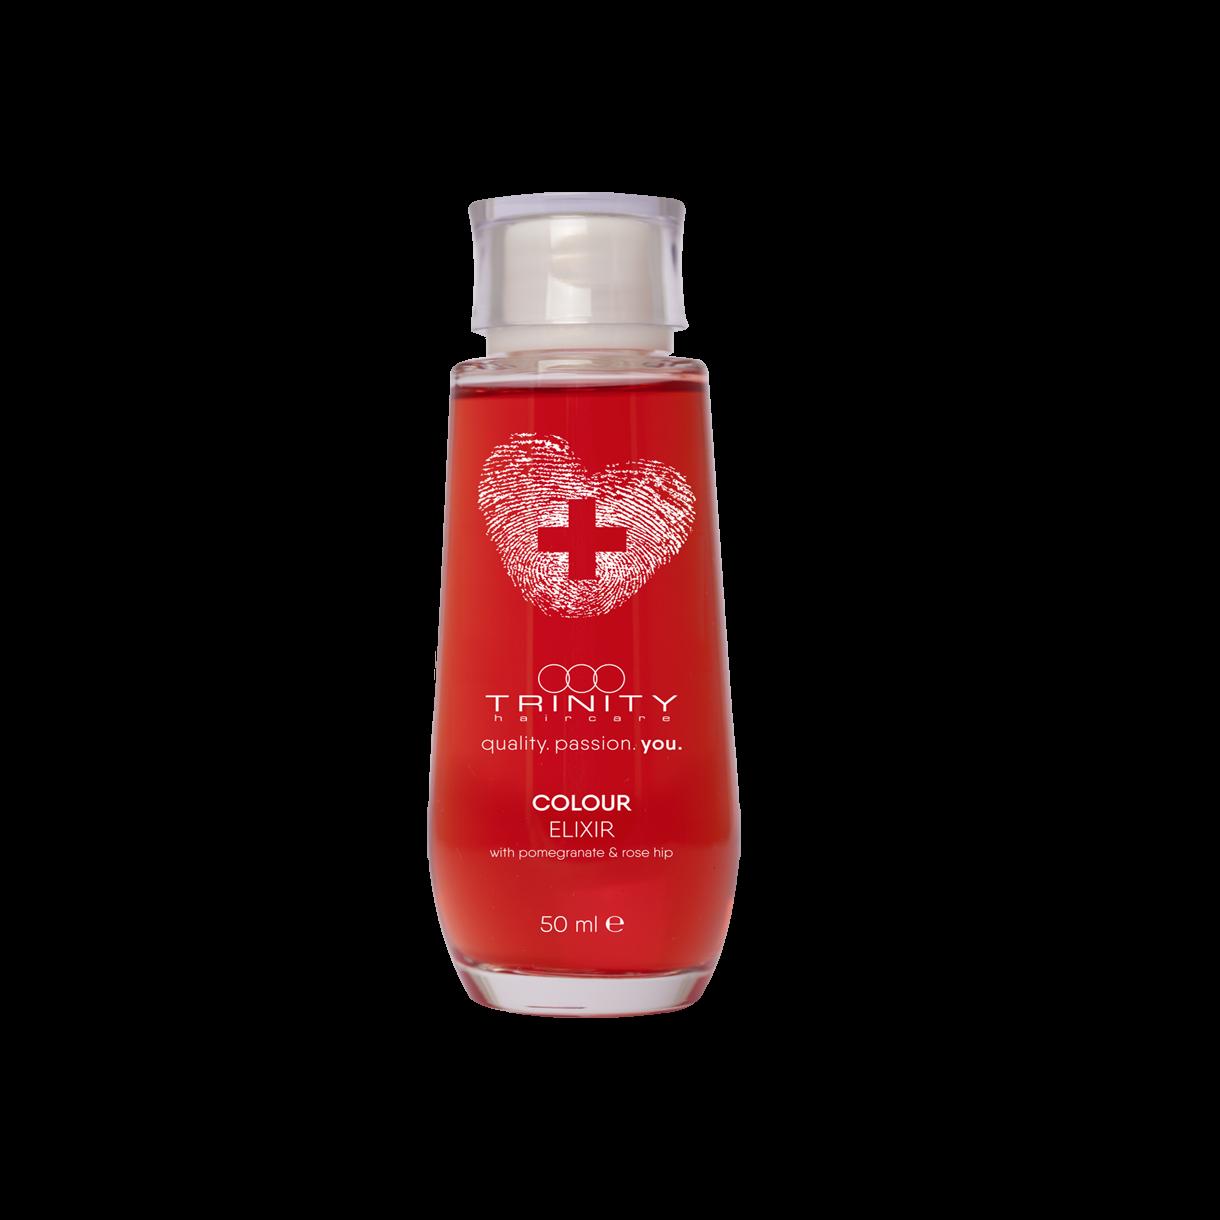 Trinity Hair Care Эликсир Essentials Colour Elixir для Окрашенных Волос, 50 мл эликсир для волос beauty elixir for your hair эликсир 50мл